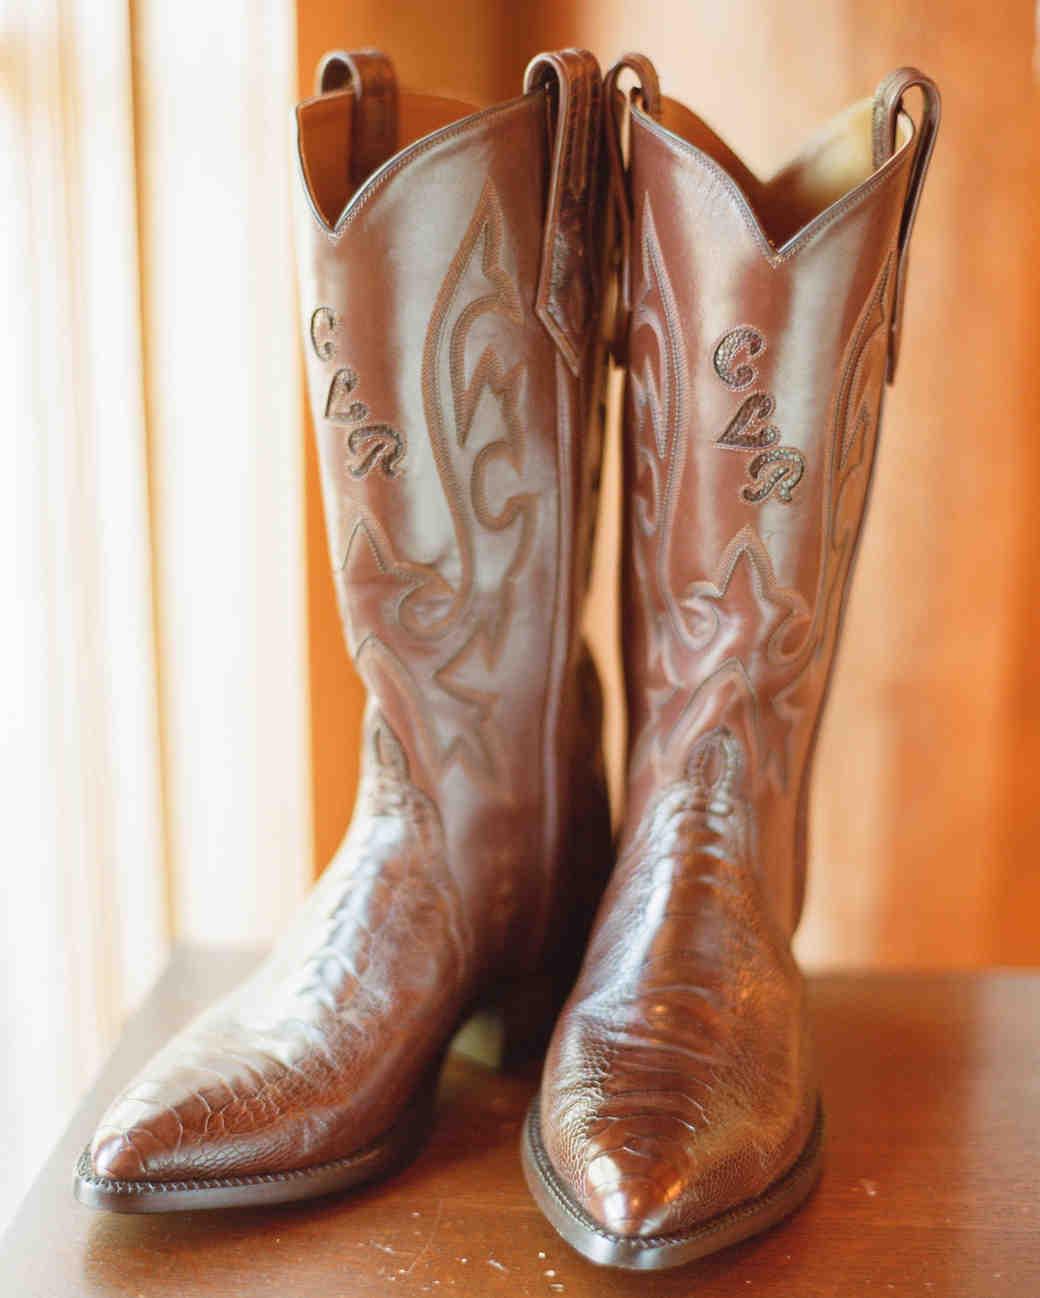 callie-eric-wedding-boots-006-s112113-0815.jpg